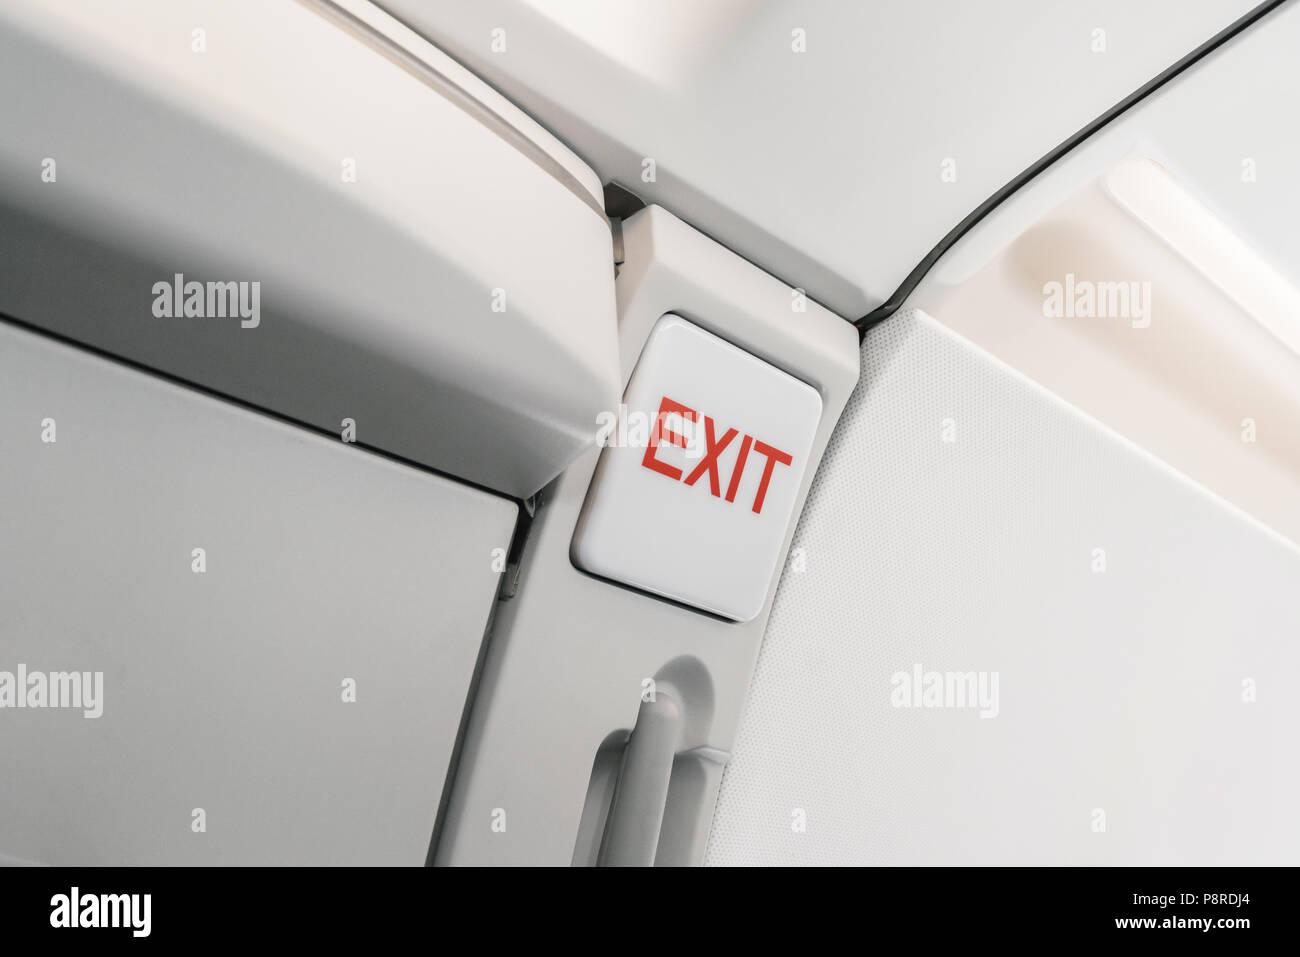 Notausgang Schild auf Flugzeug. Leere Flugzeug sitze in der Kabine. Moderne Transportkonzept. Flugzeuge - Internationaler Flug Stockbild